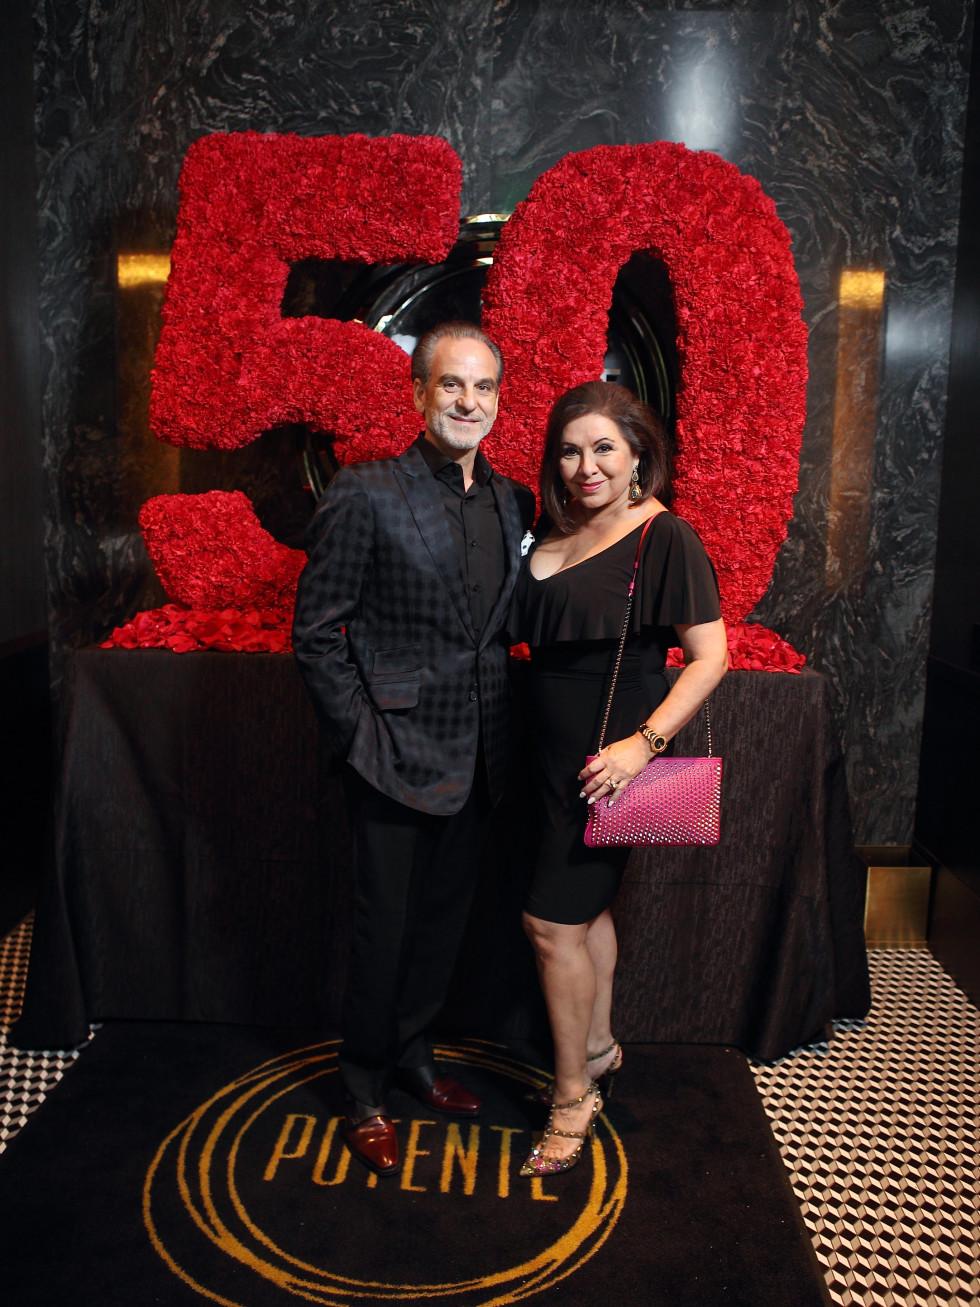 Jeff Bagwell 50th birthday Potente Rudy and Debbie Festari